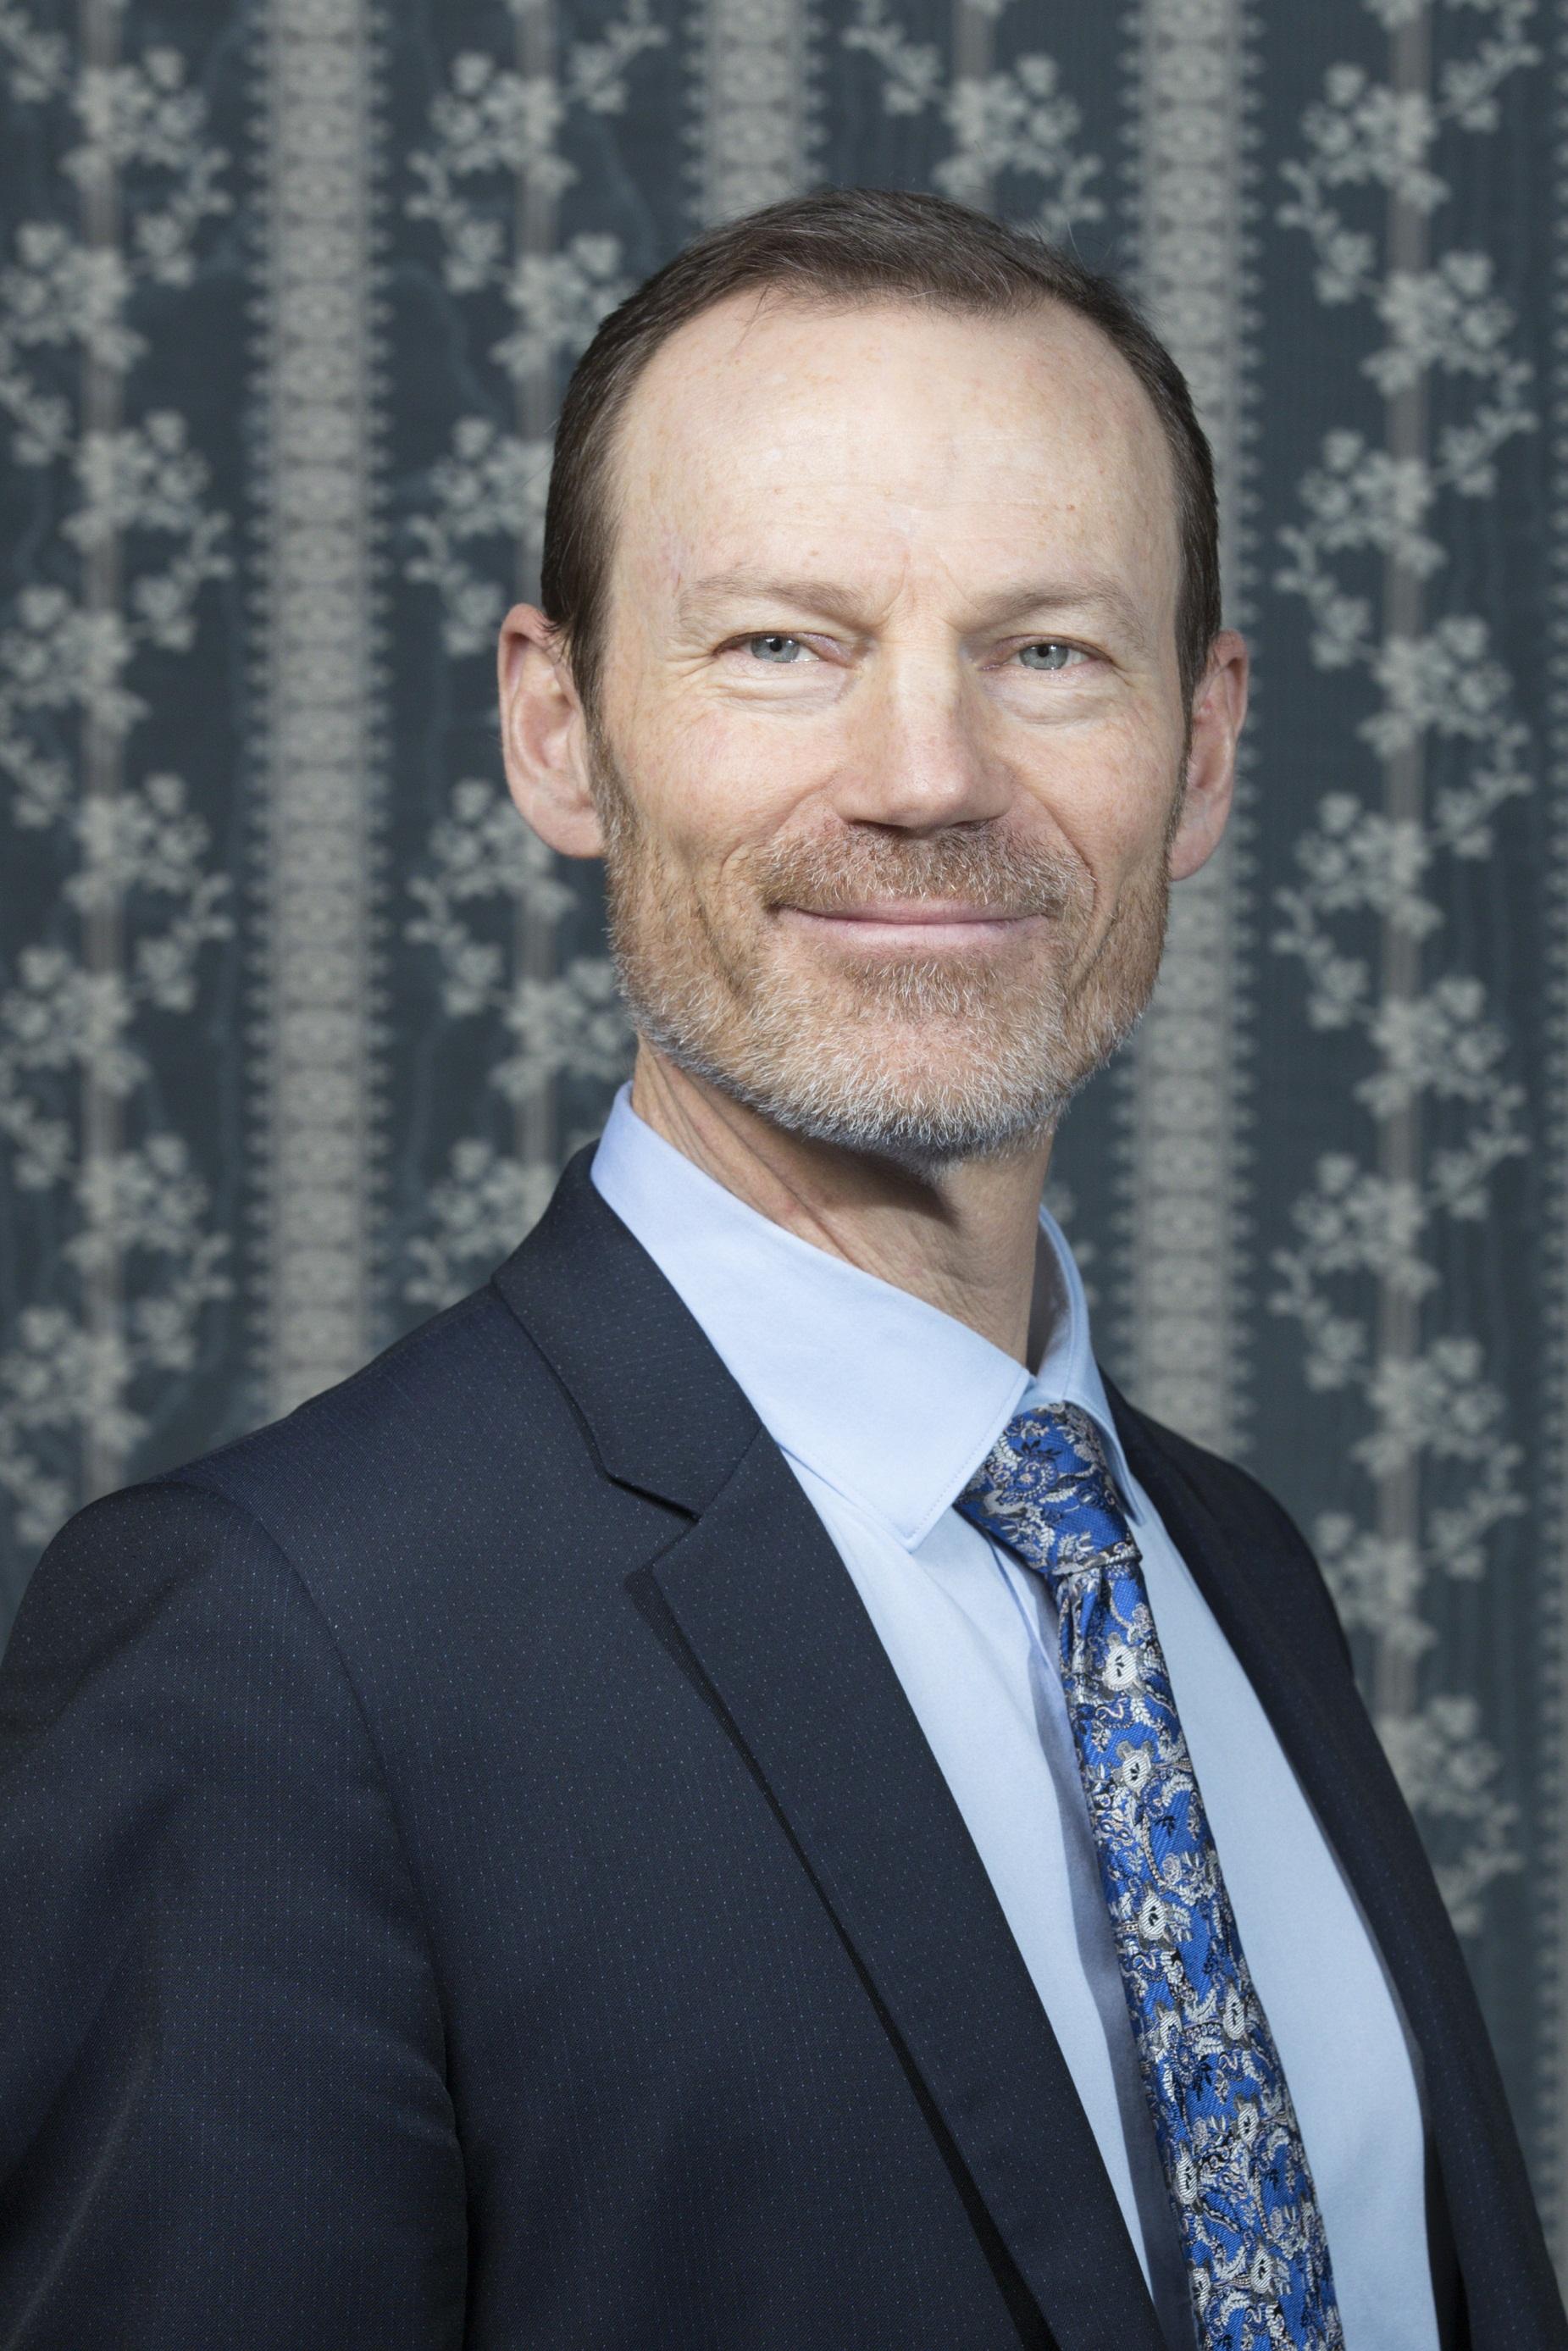 David Charmatz